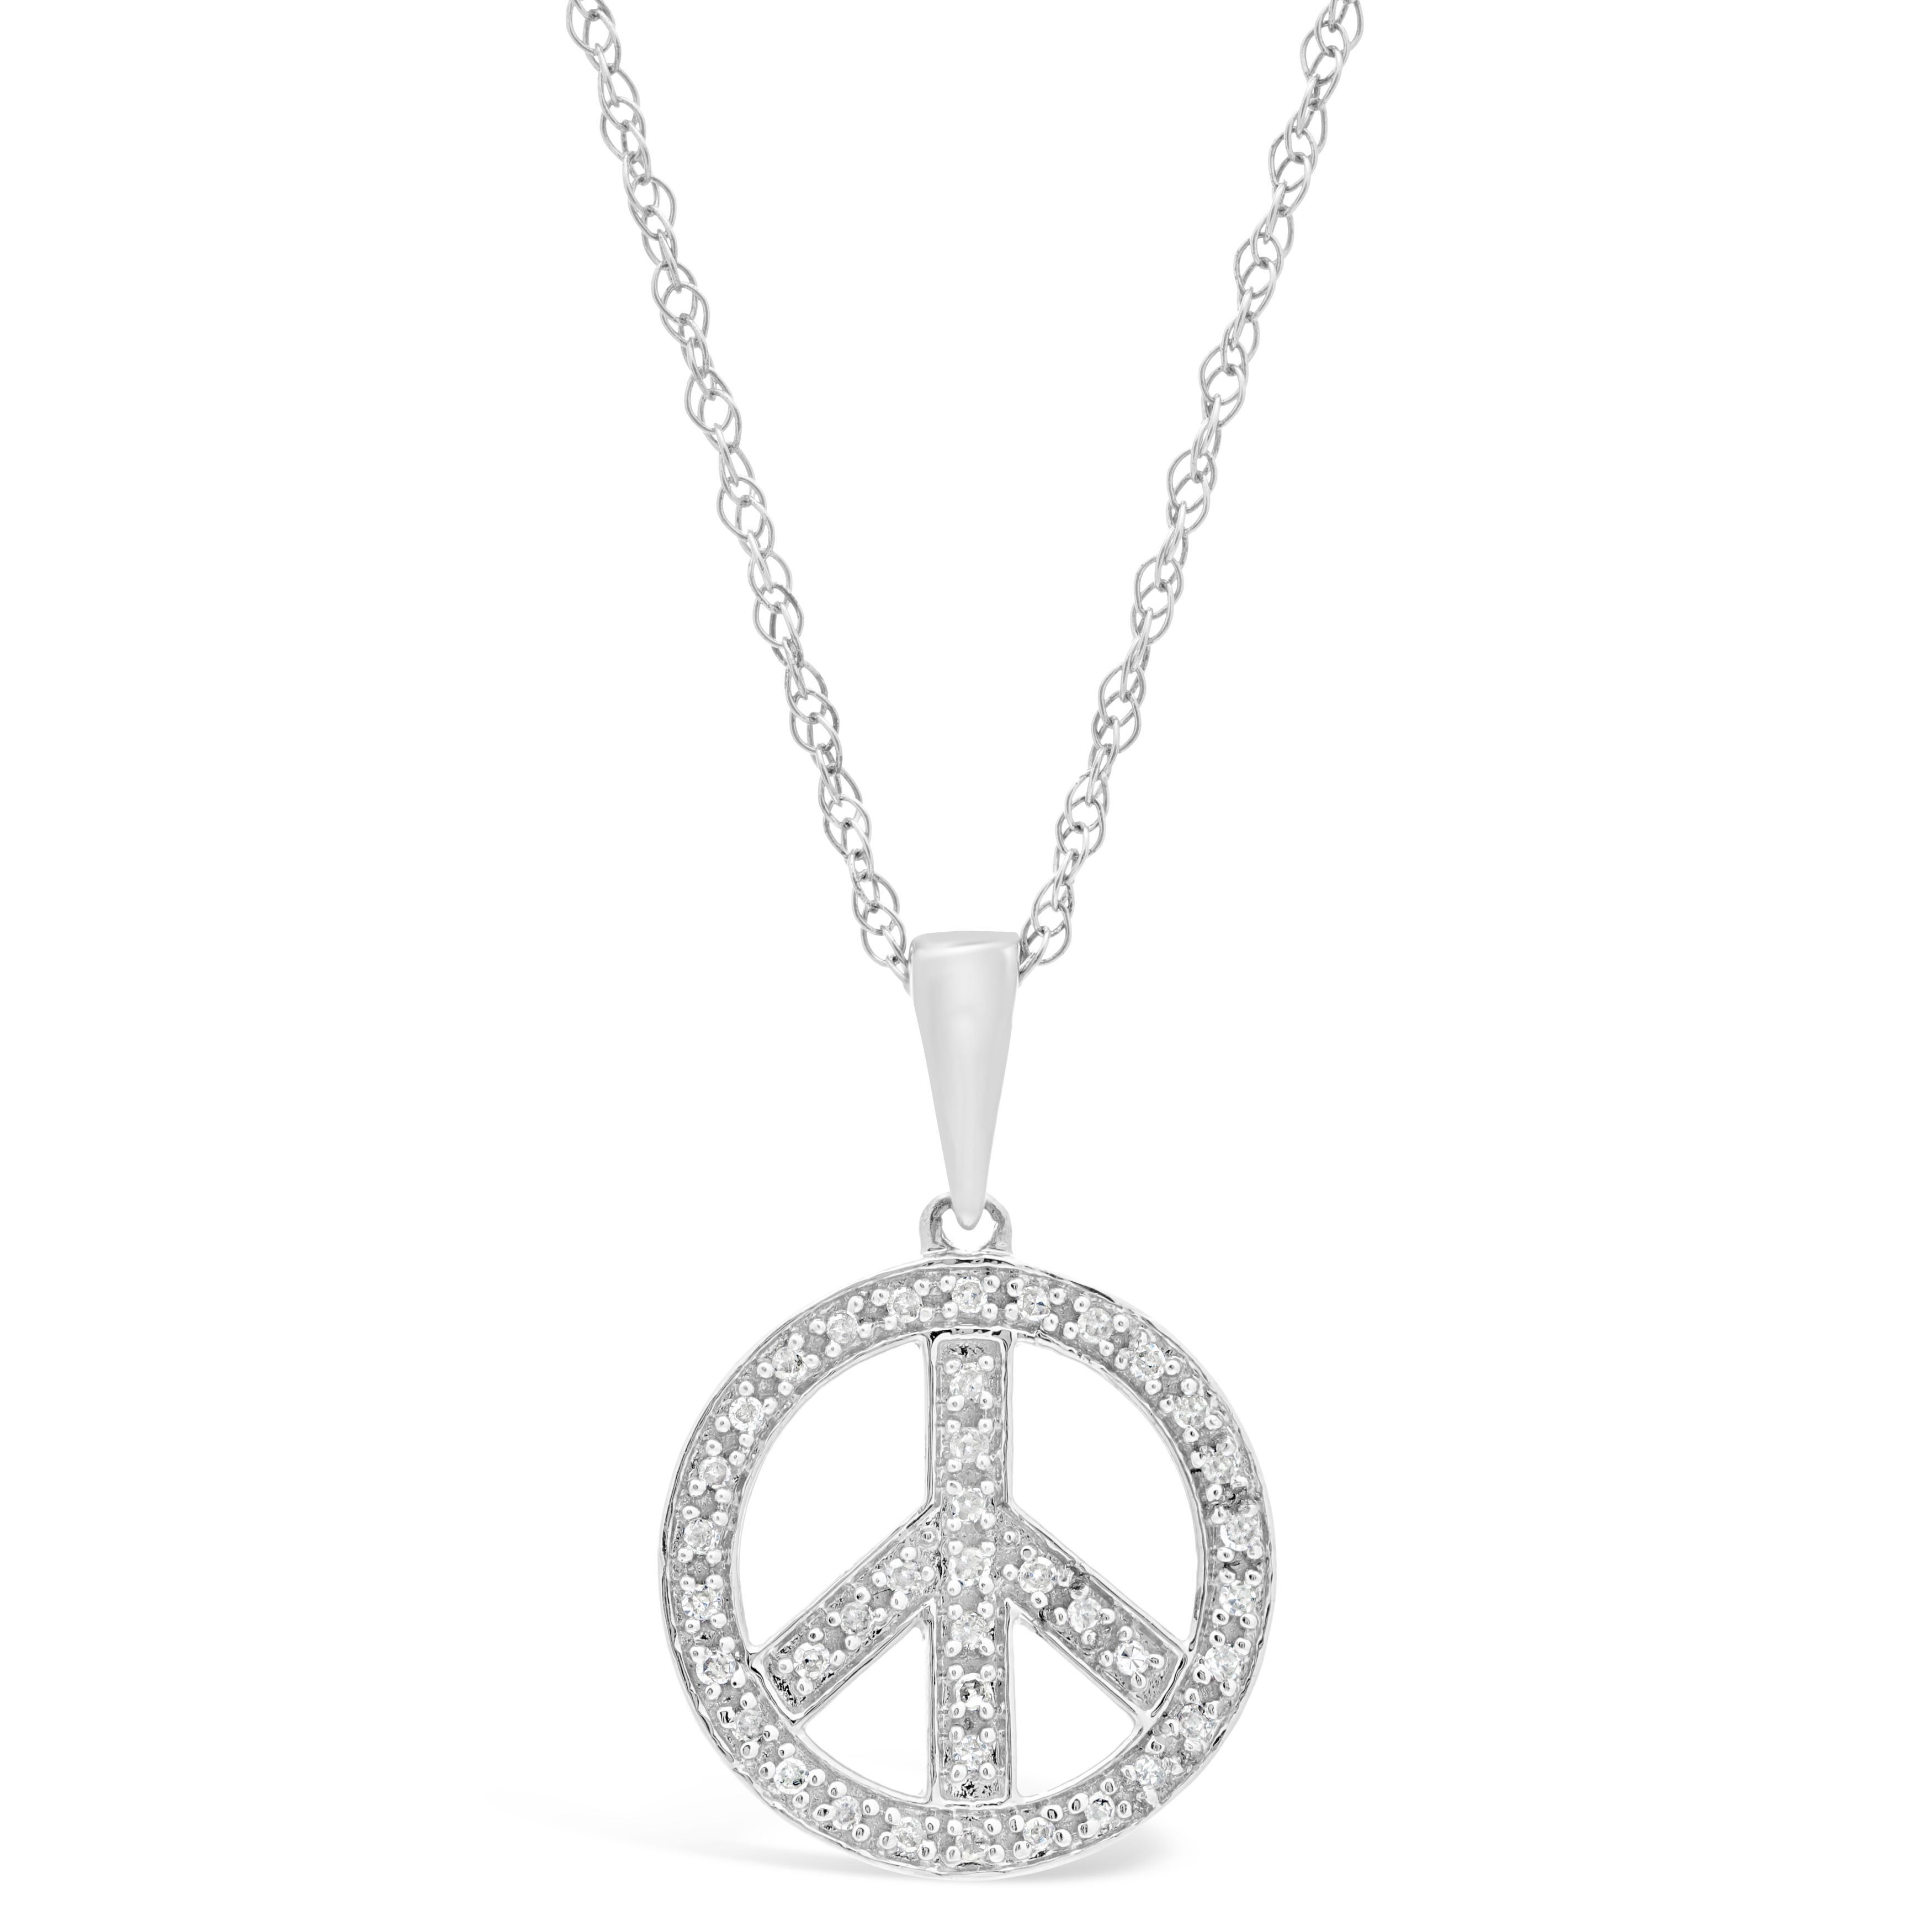 Sterling Silver 1/8 ct. TDW Diamond Peace-sign Pendant Ne...